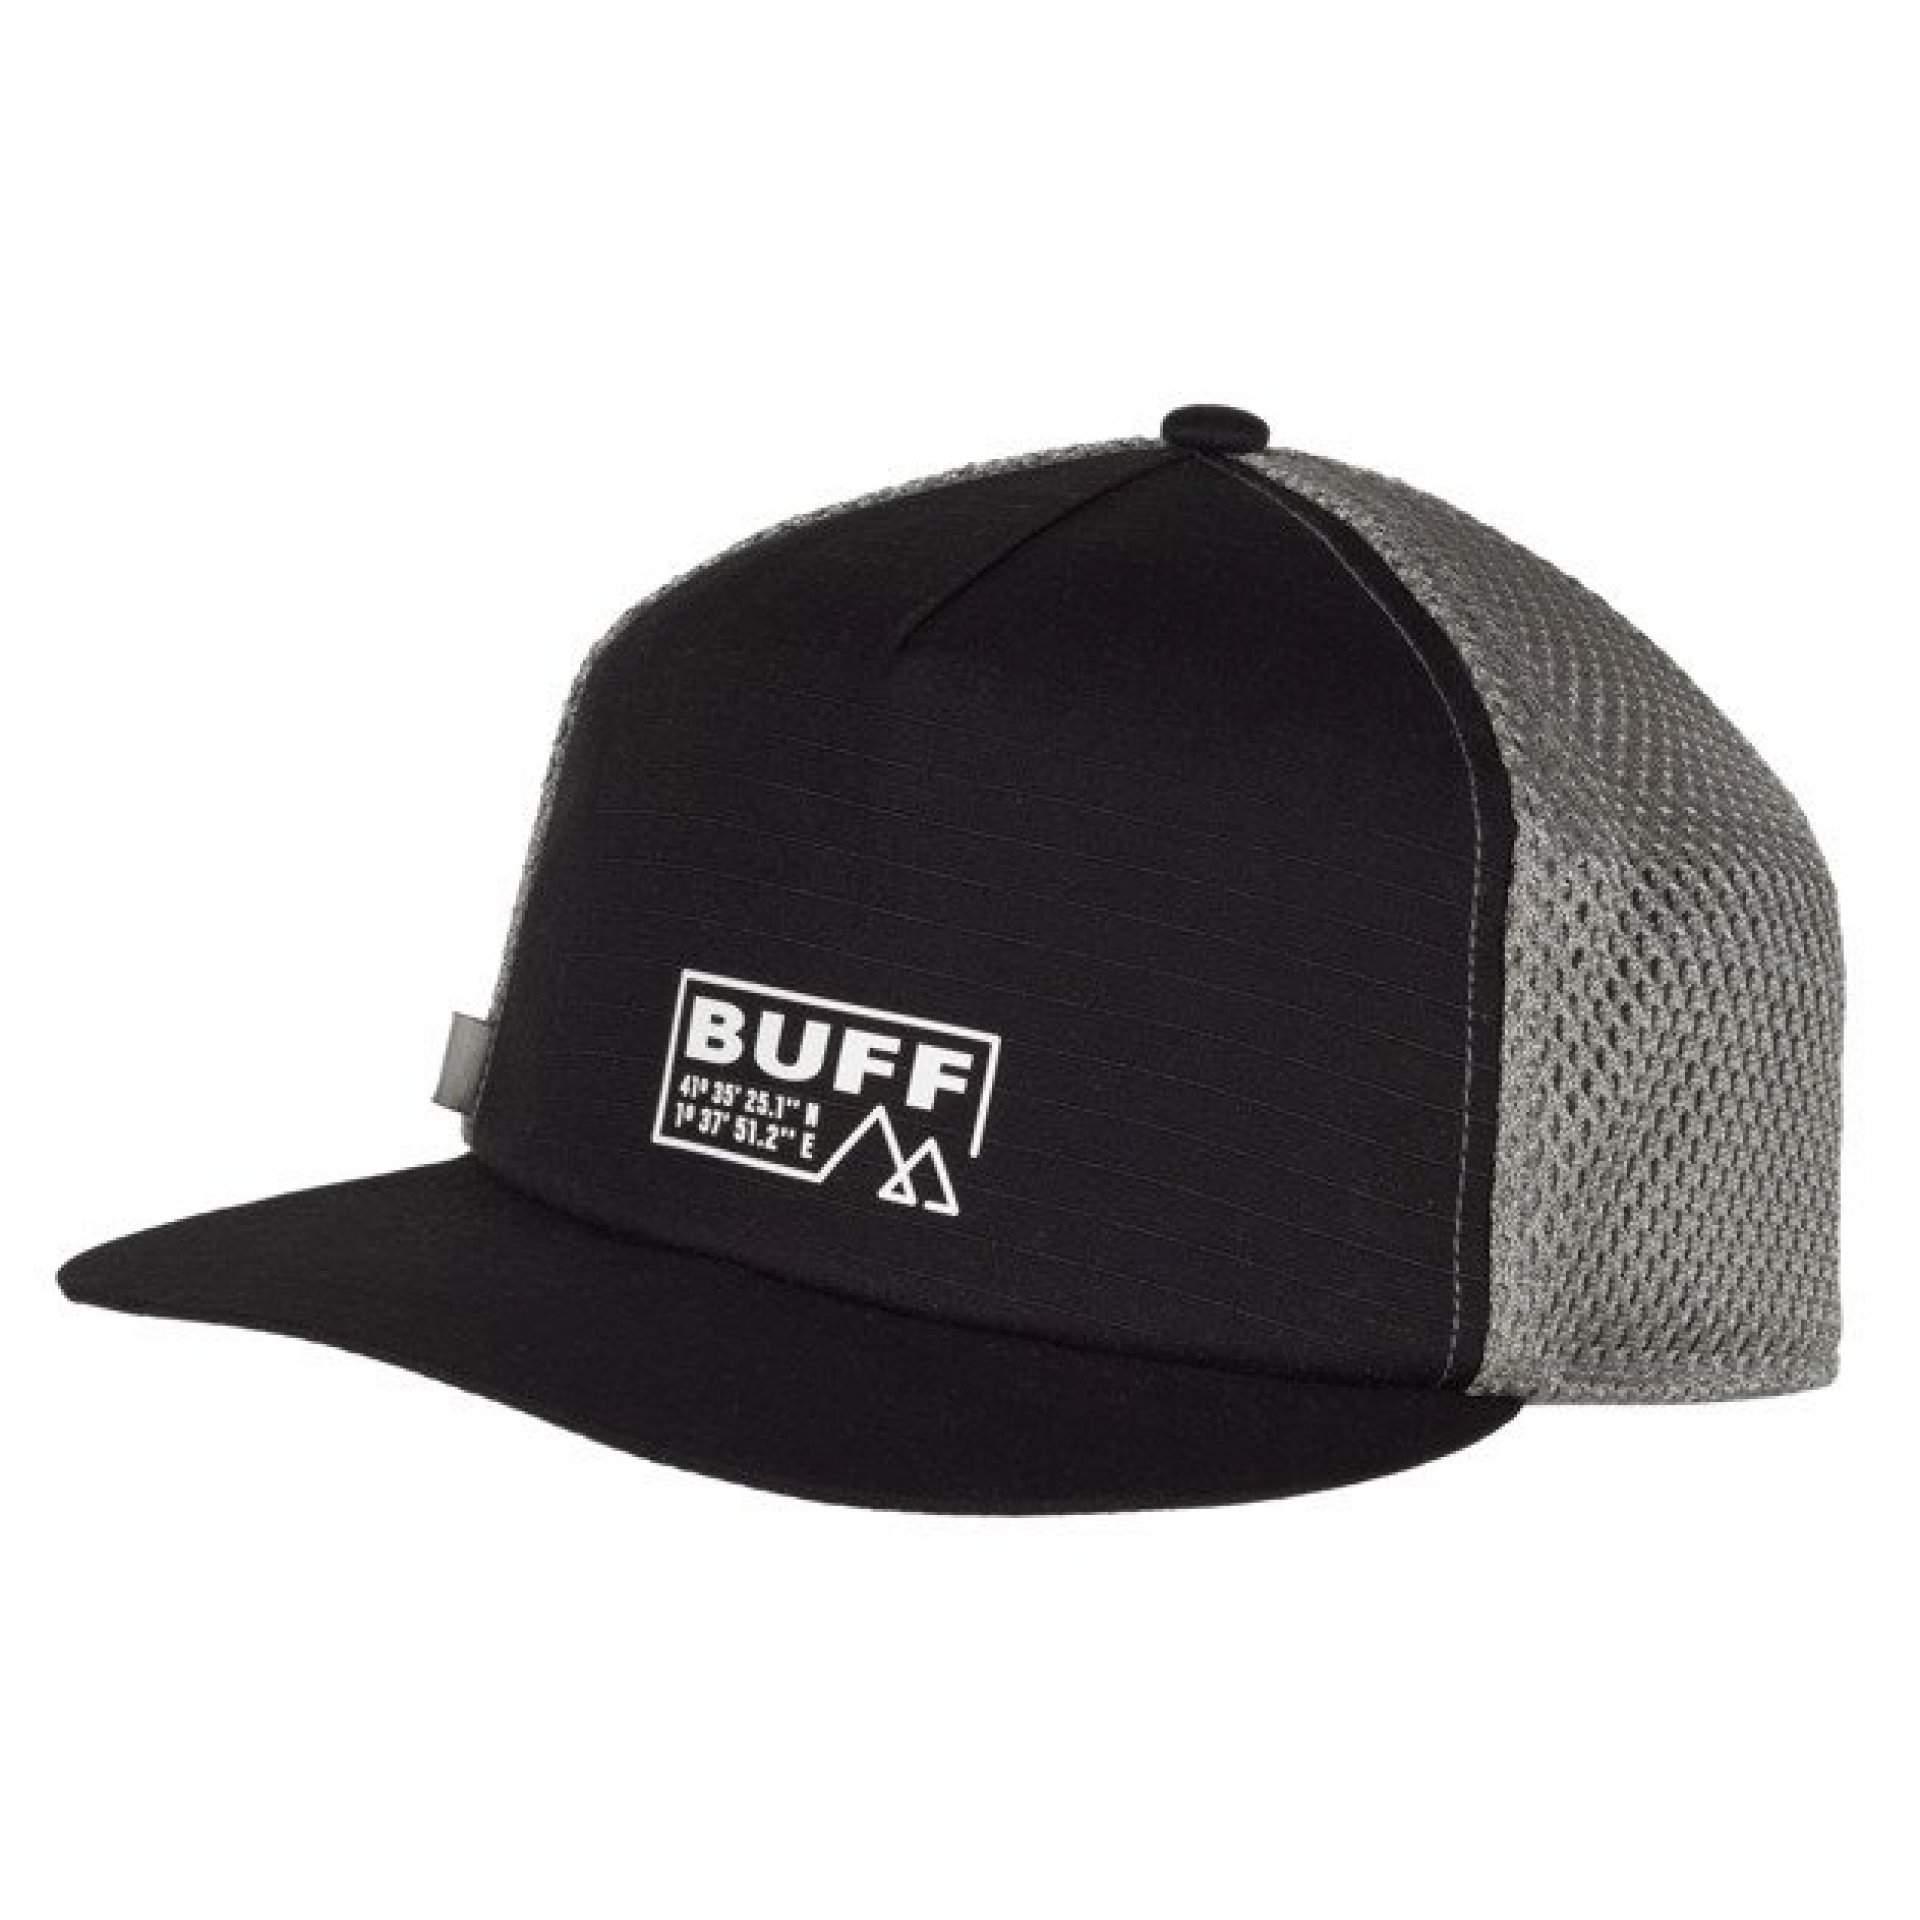 CZAPKA Z DASZKIEM BUFF PACK TRUCKER CAP SOLID BLACK